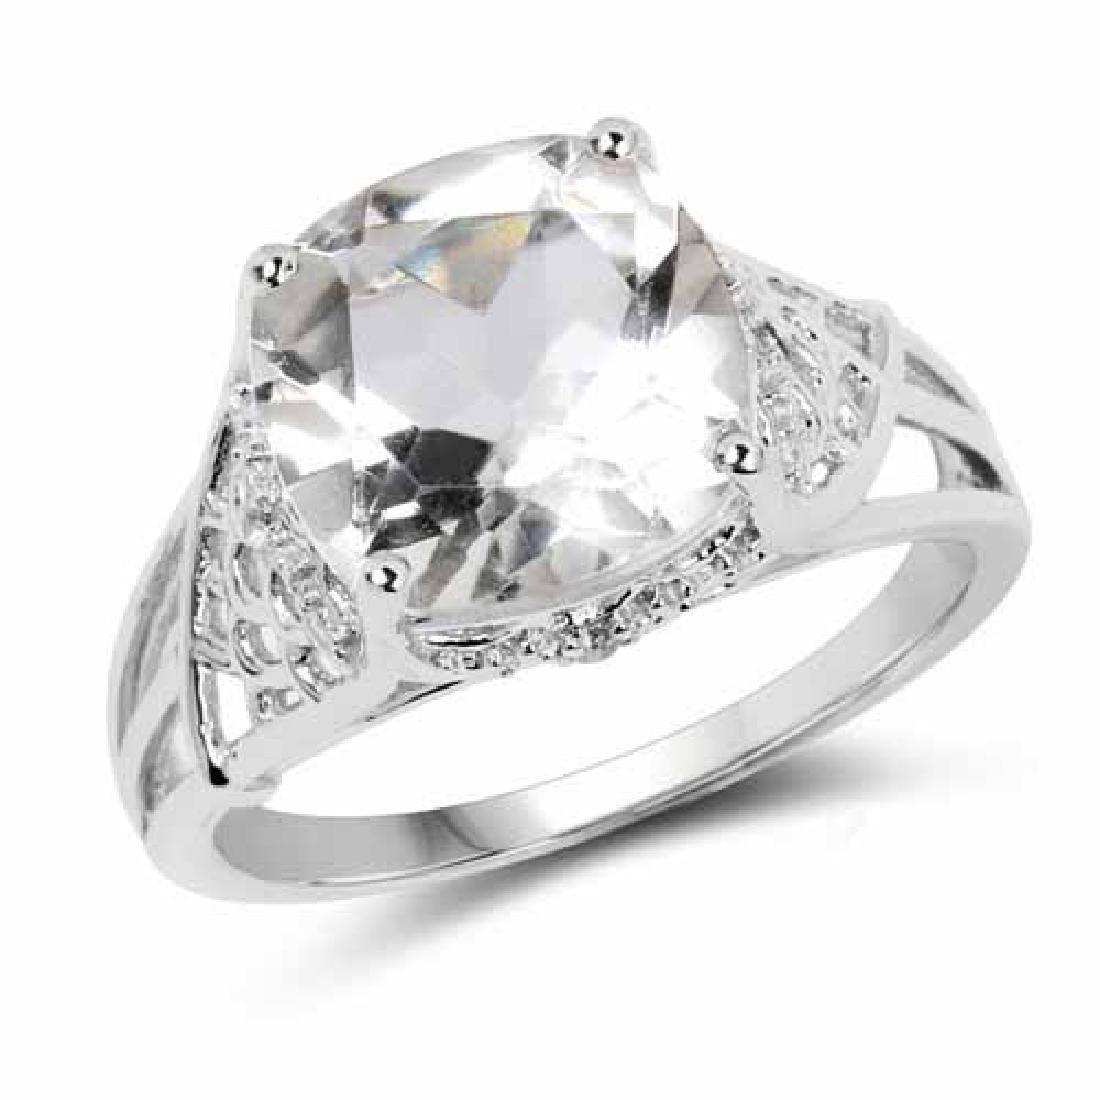 3.39 Carat Genuine Crystal Quartz and White Topaz .925